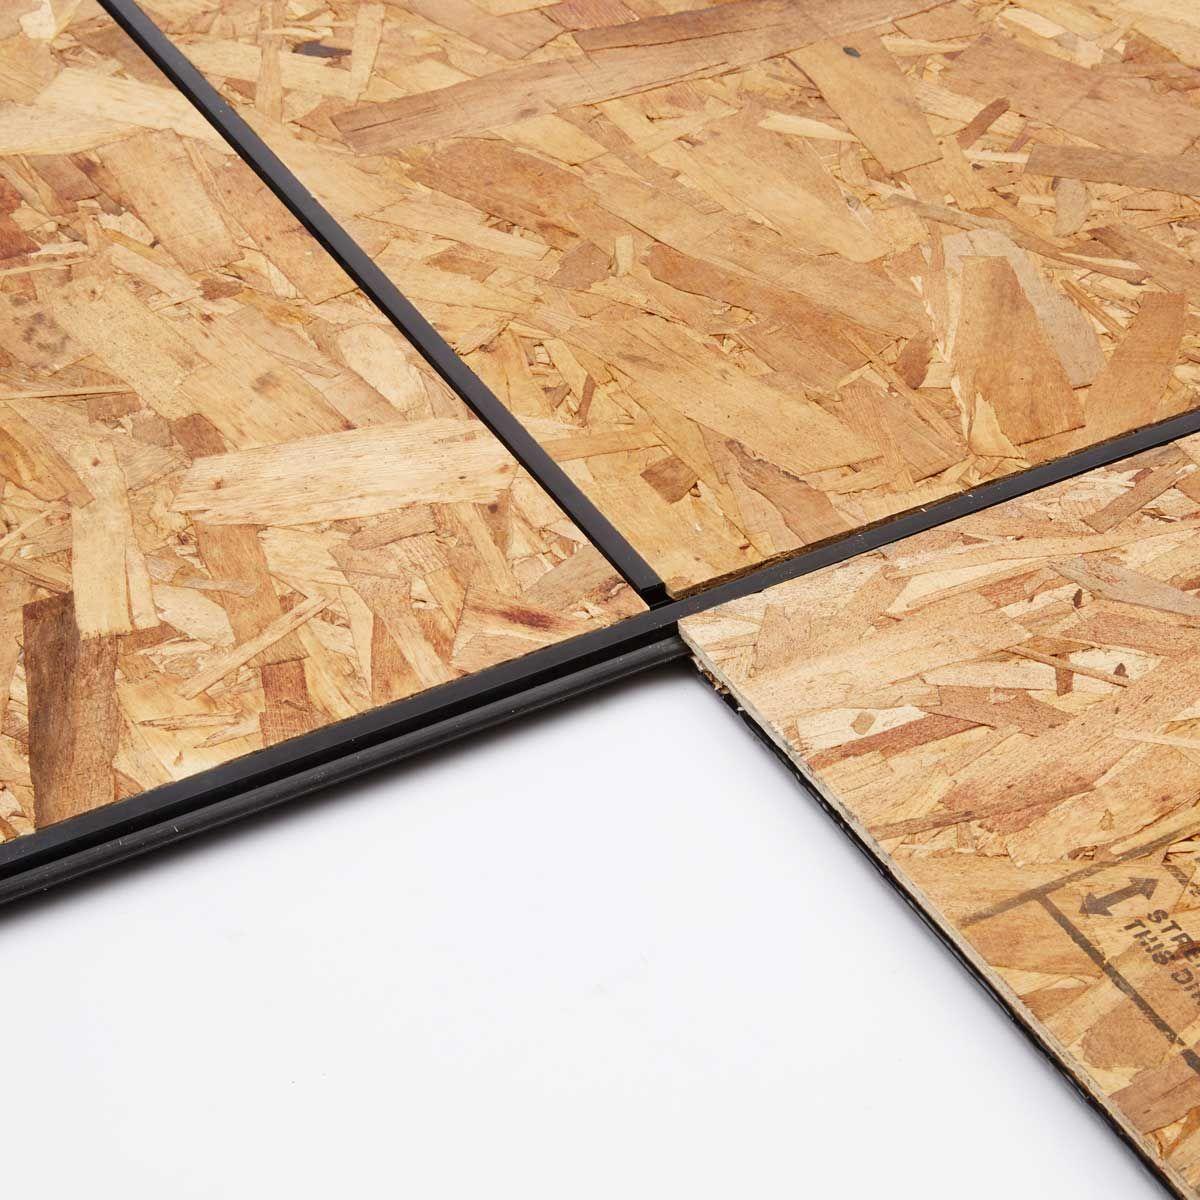 Basement Renovation Dricore Subfloor Installation: Install A Warm, Moisture-Resistant Basement Subfloor In A Day